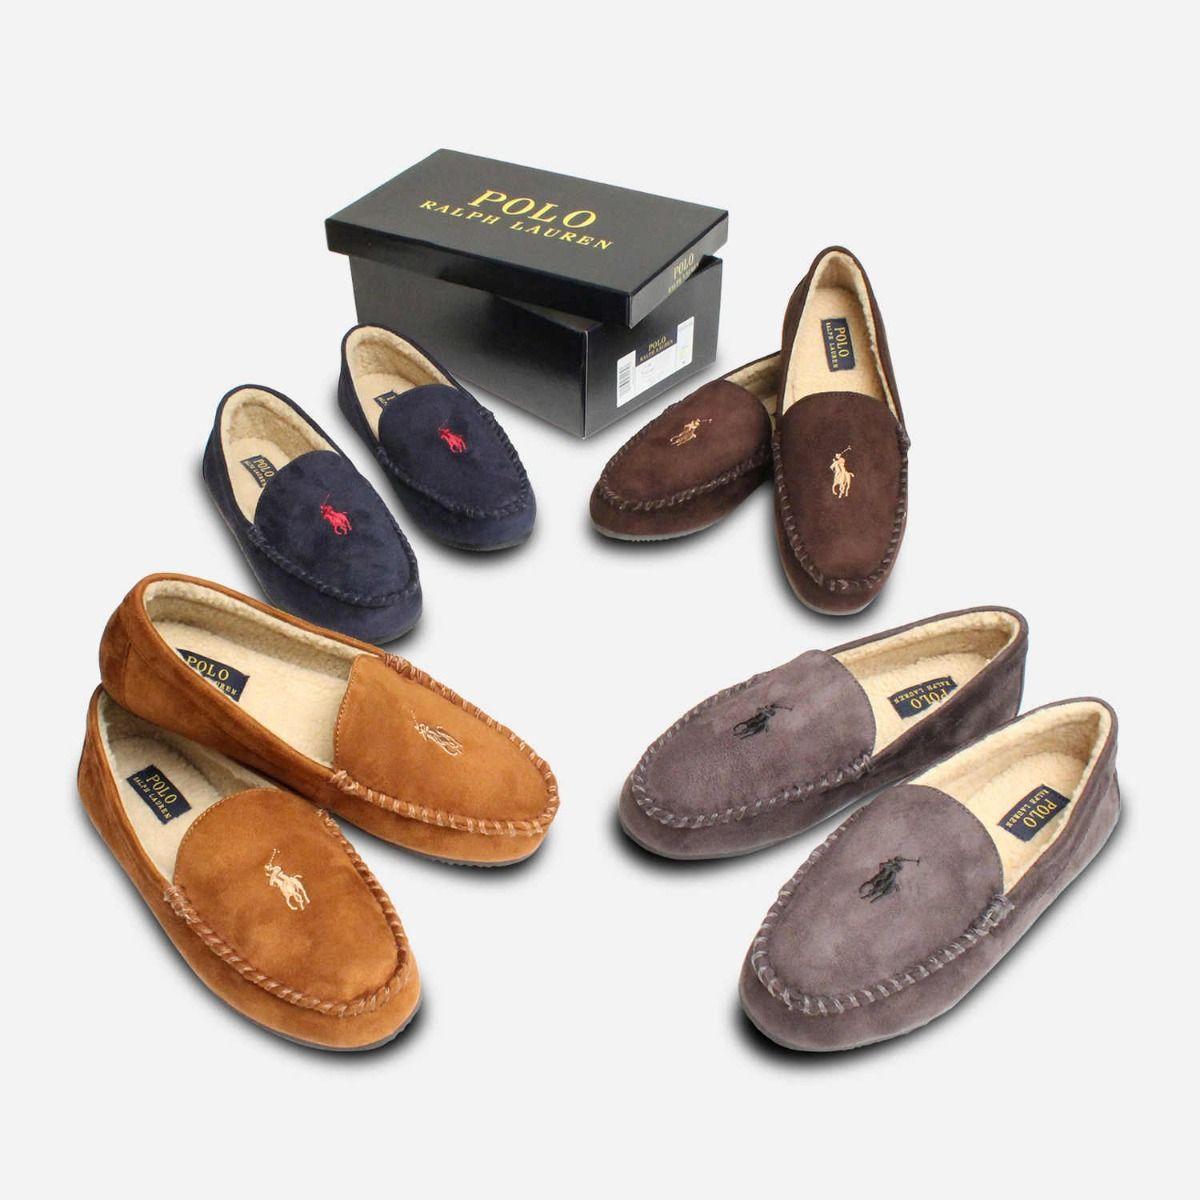 Ralph Lauren Polo Mens Slippers in